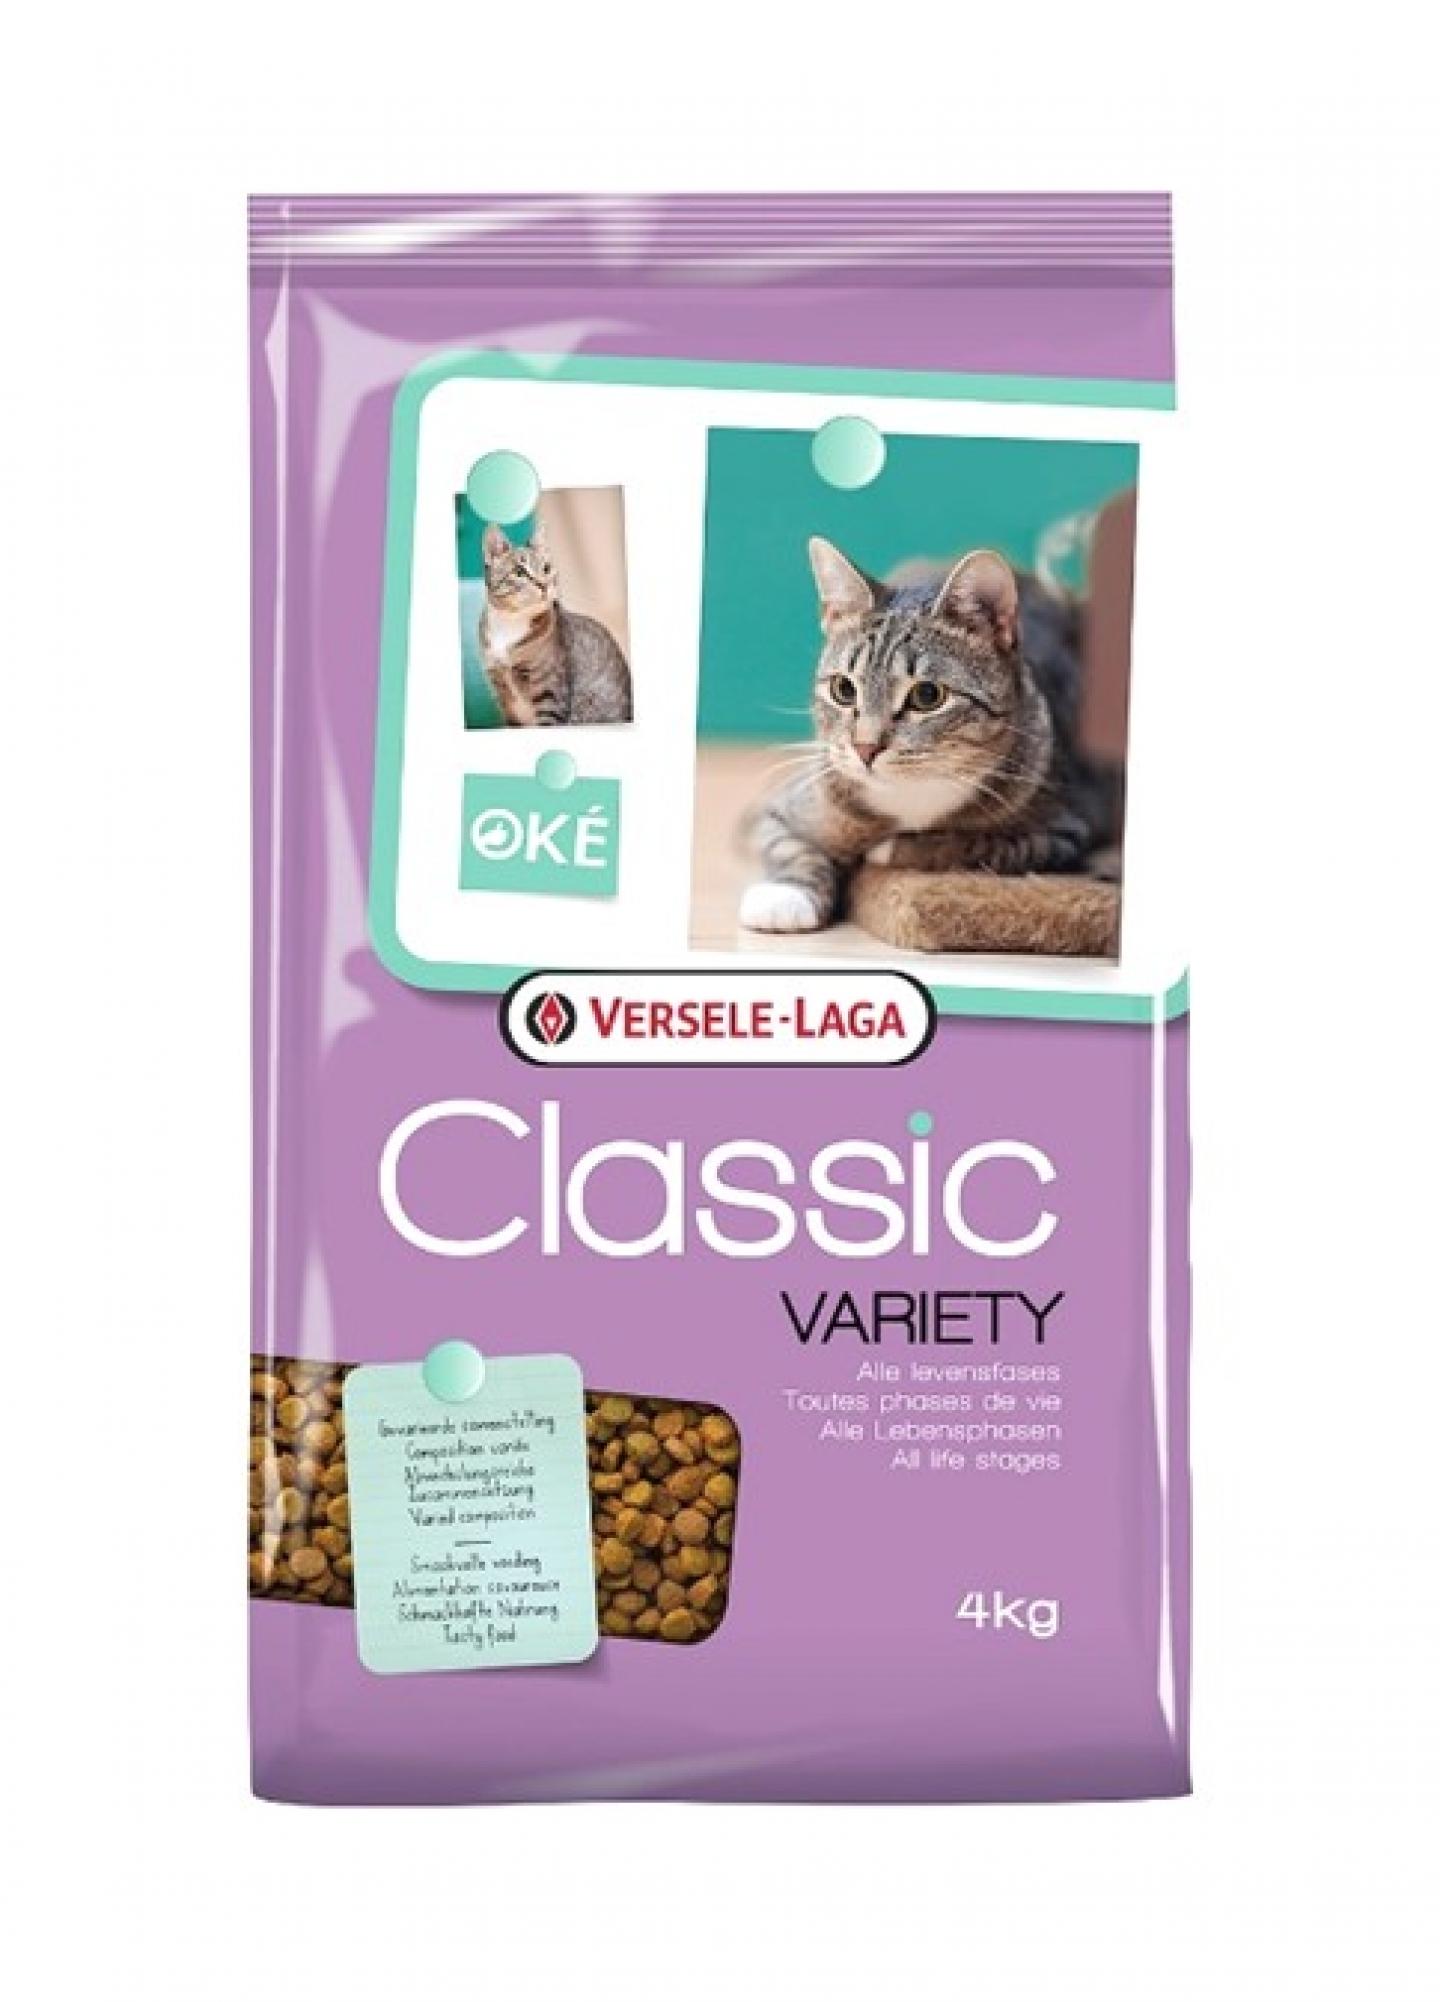 Versele-Laga Oke Classic Cat Variety, 4 kg imagine